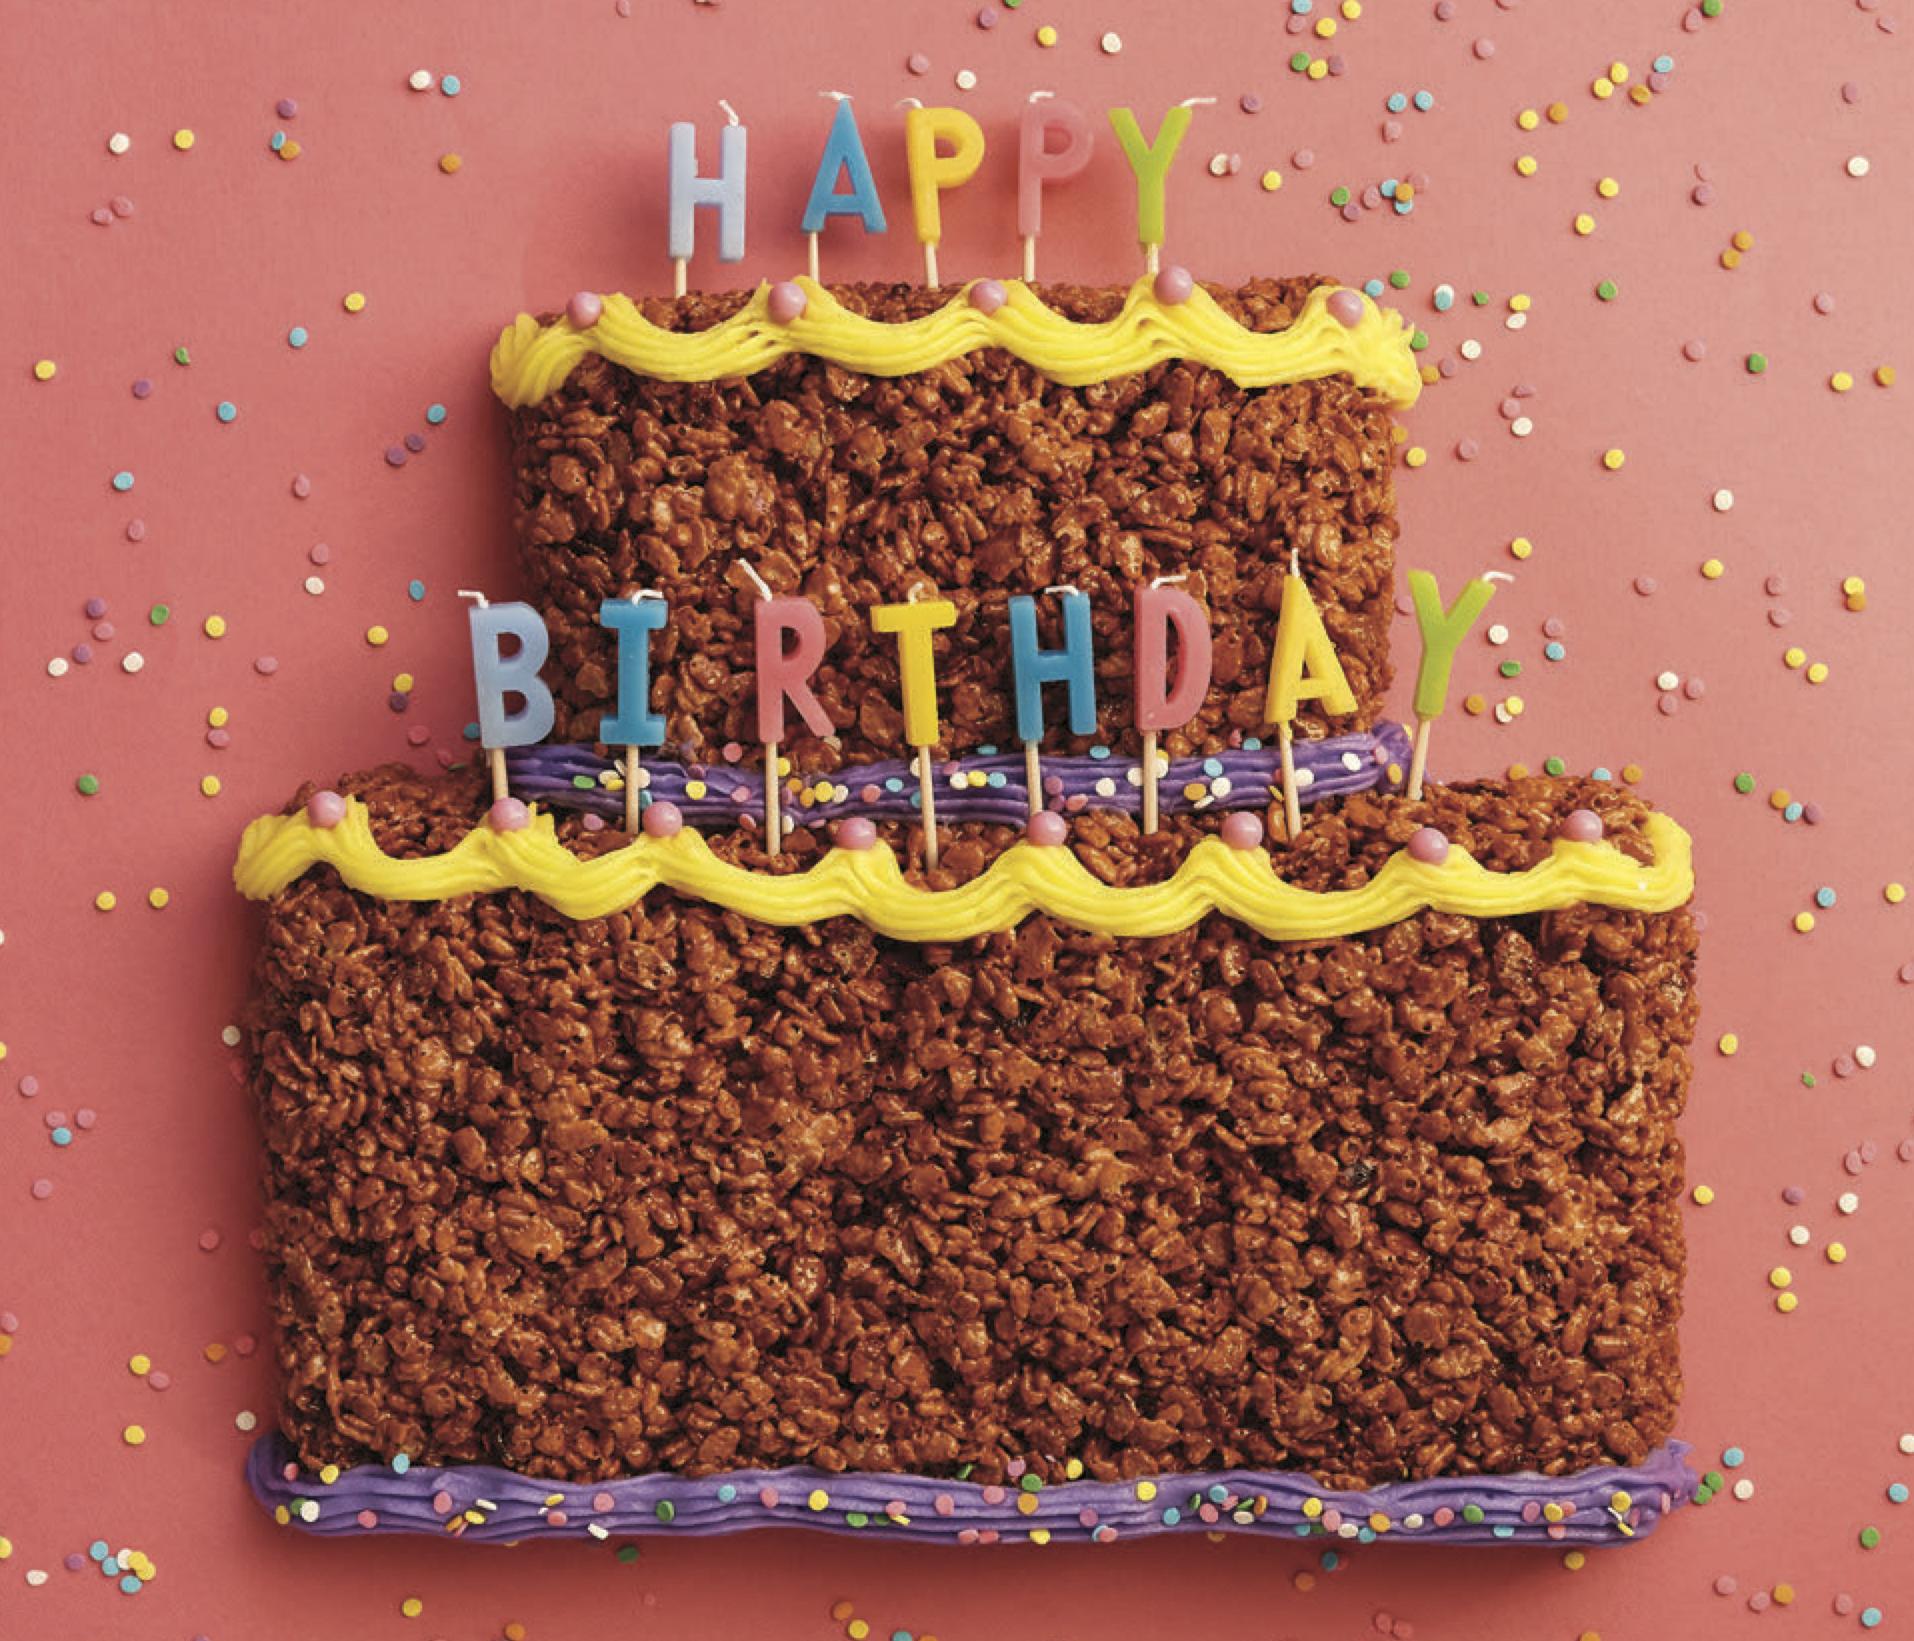 Outstanding Crispy Rice Birthday Cake Workman Publishing Funny Birthday Cards Online Elaedamsfinfo